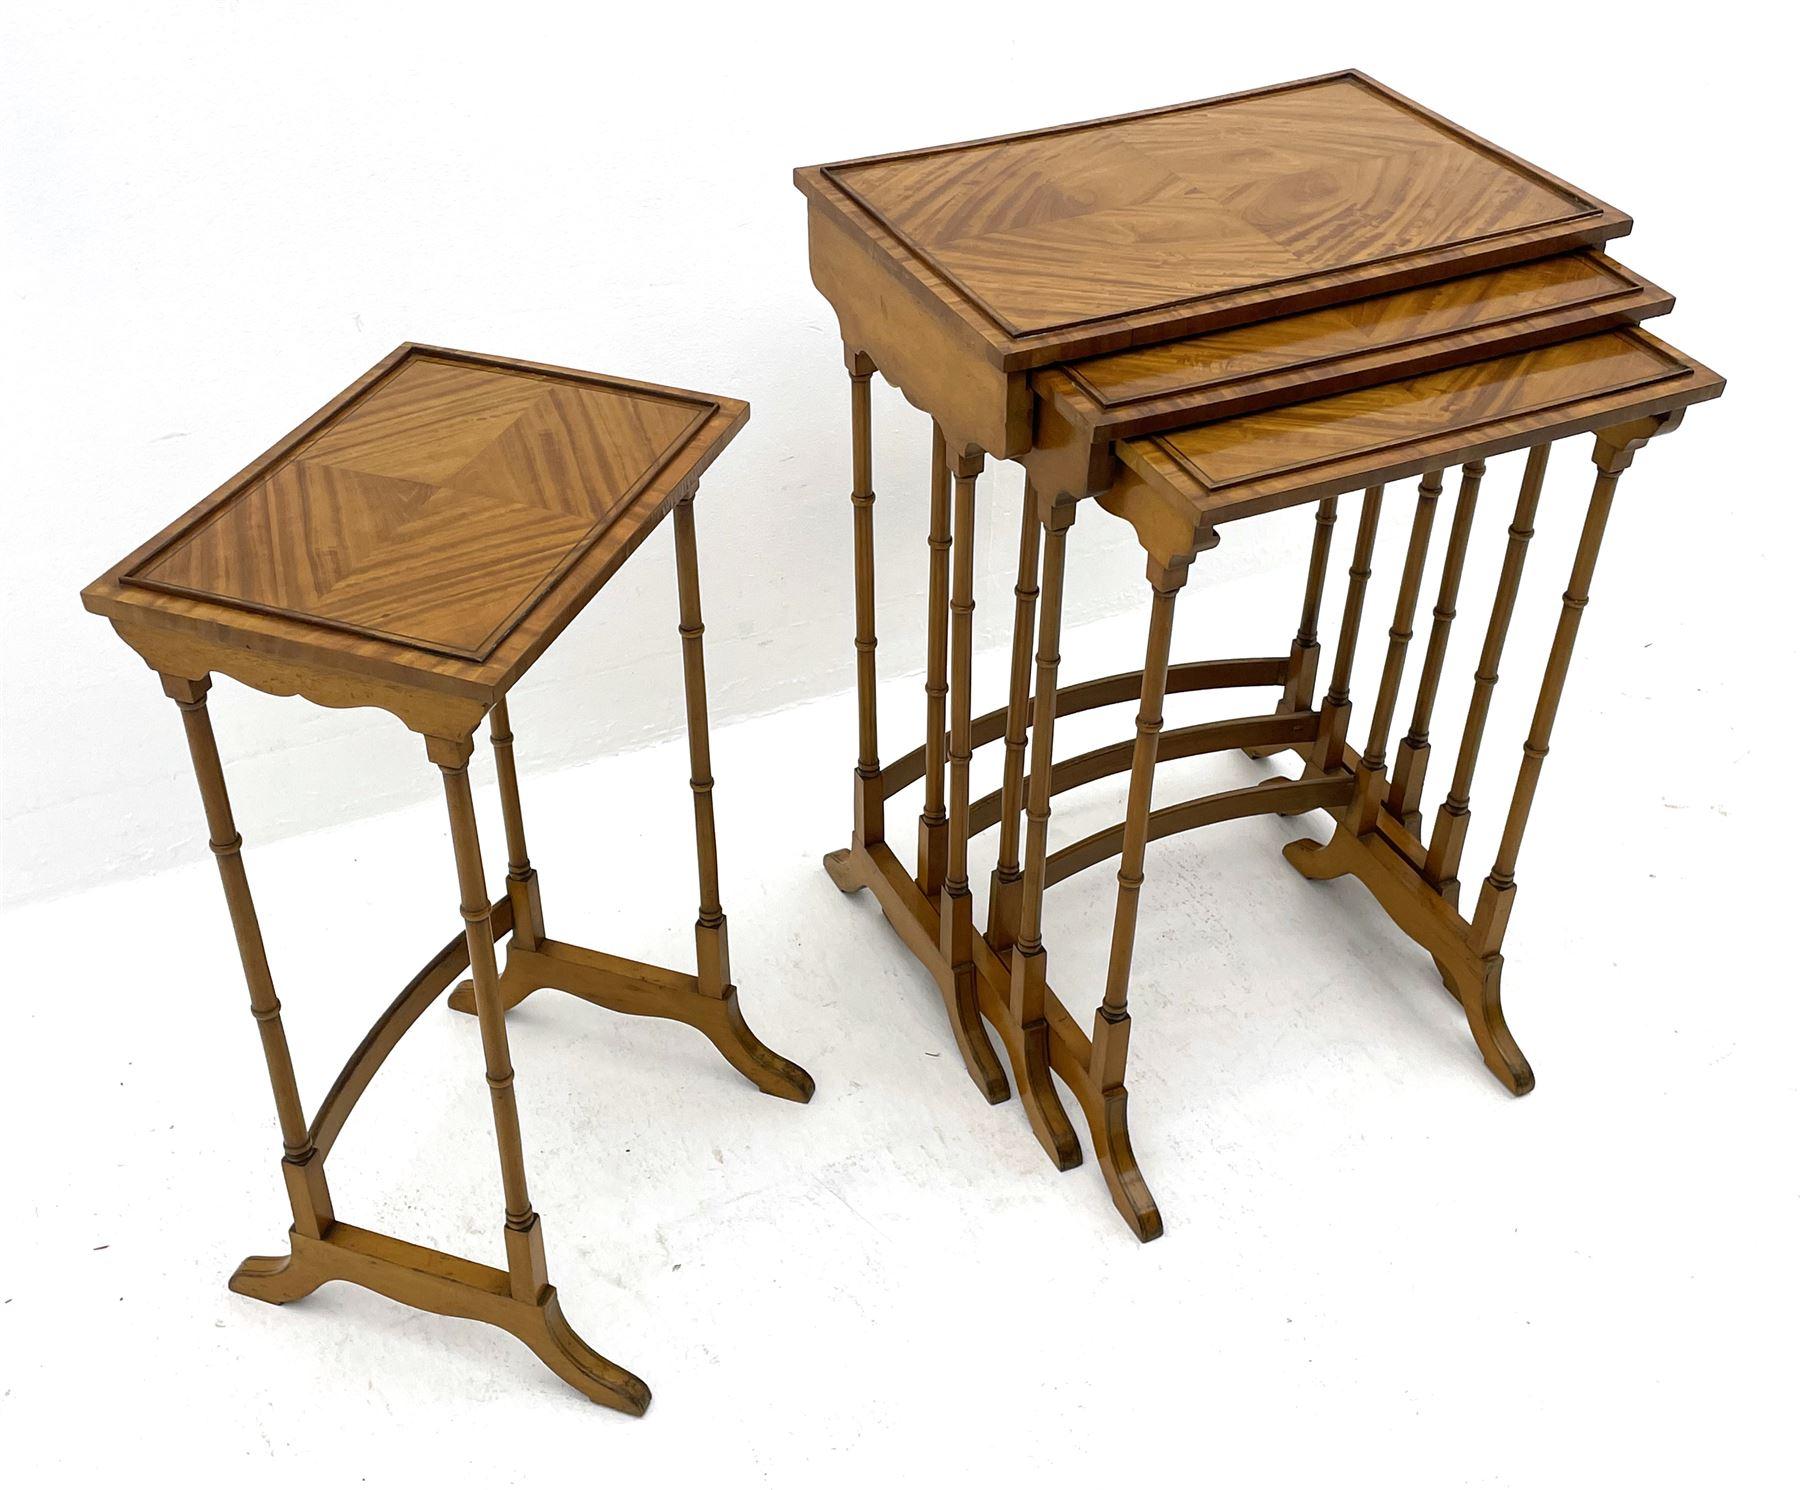 Edwardian satinwood quartetto nest of occasional tables - Image 2 of 6